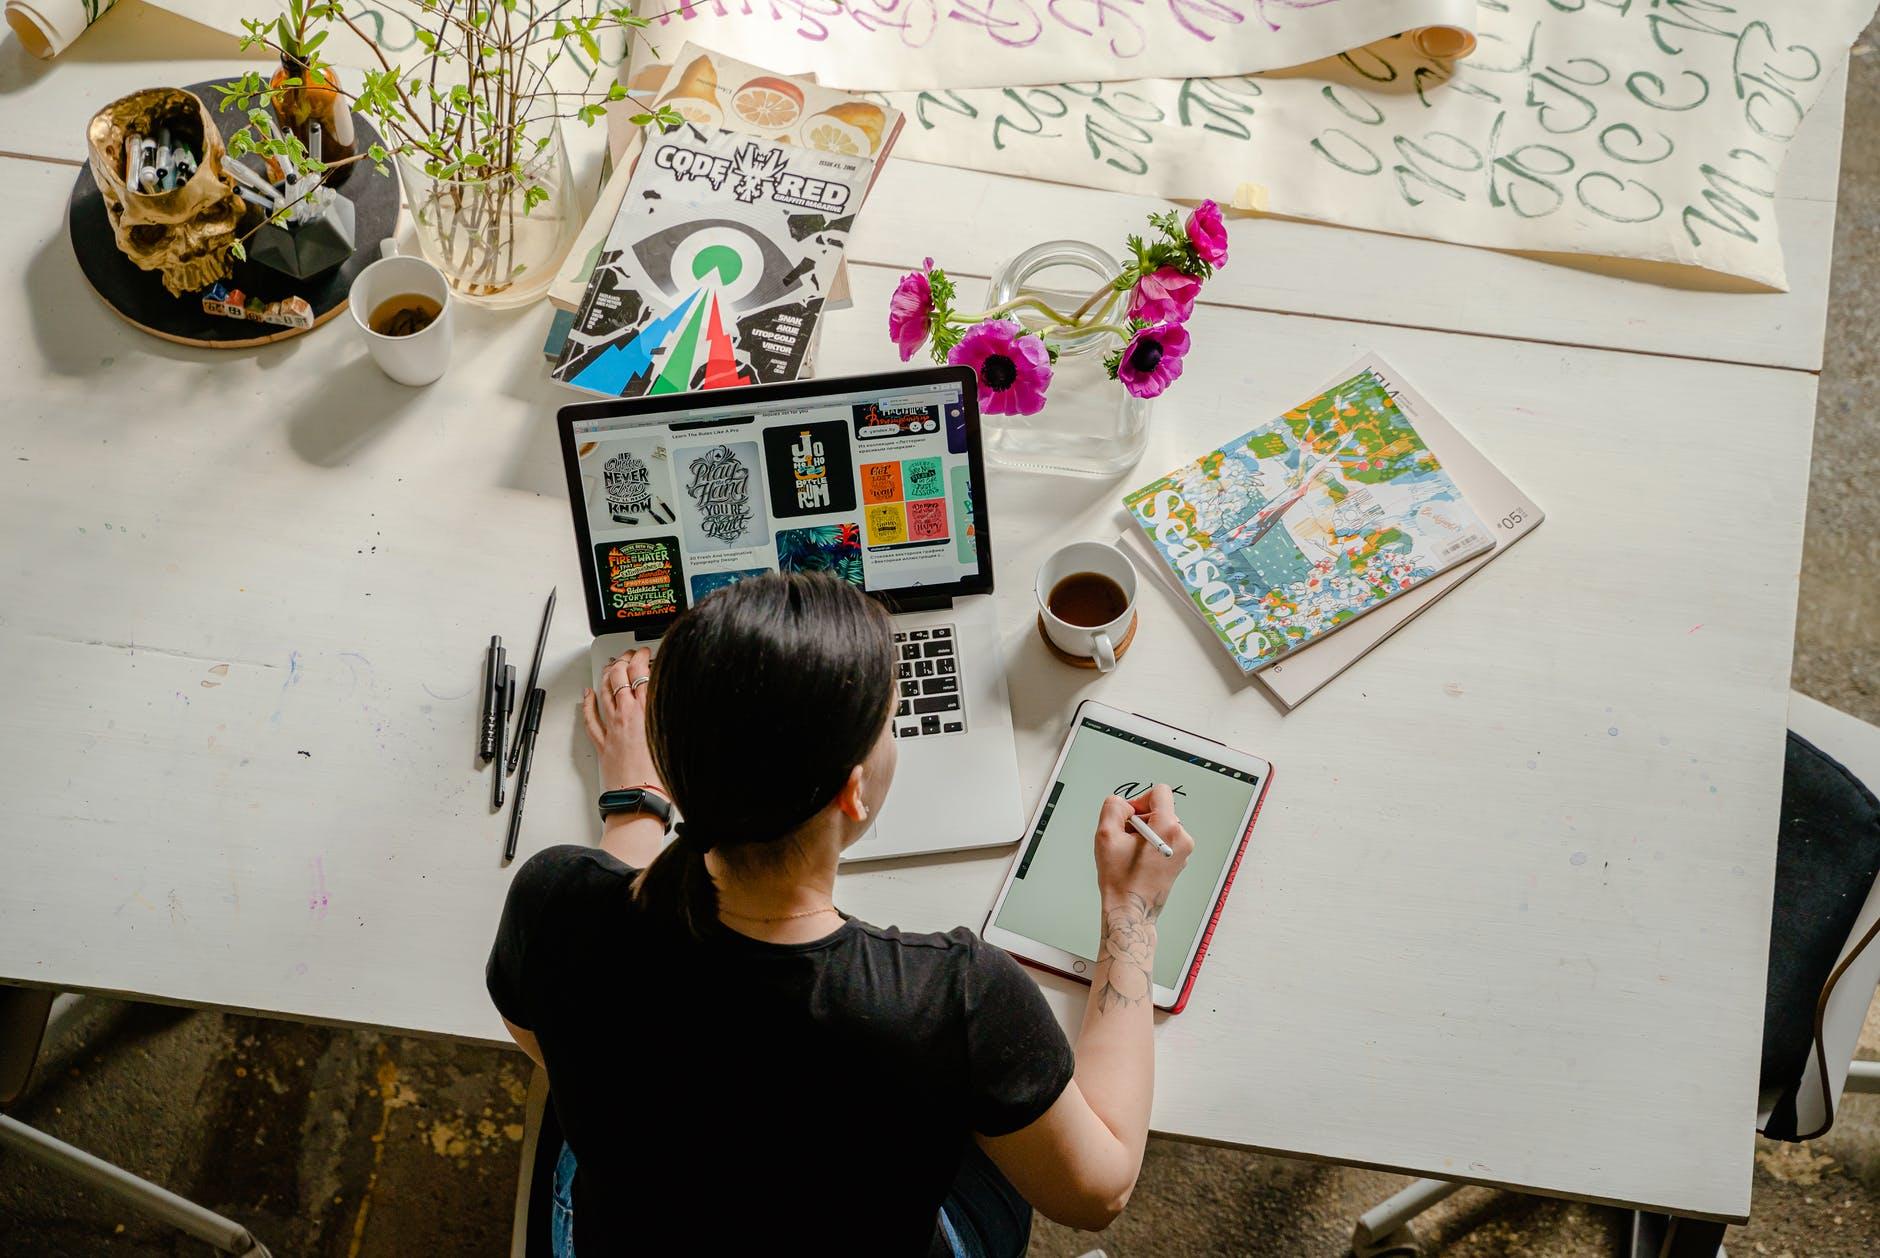 digitaliser son activité artisanale